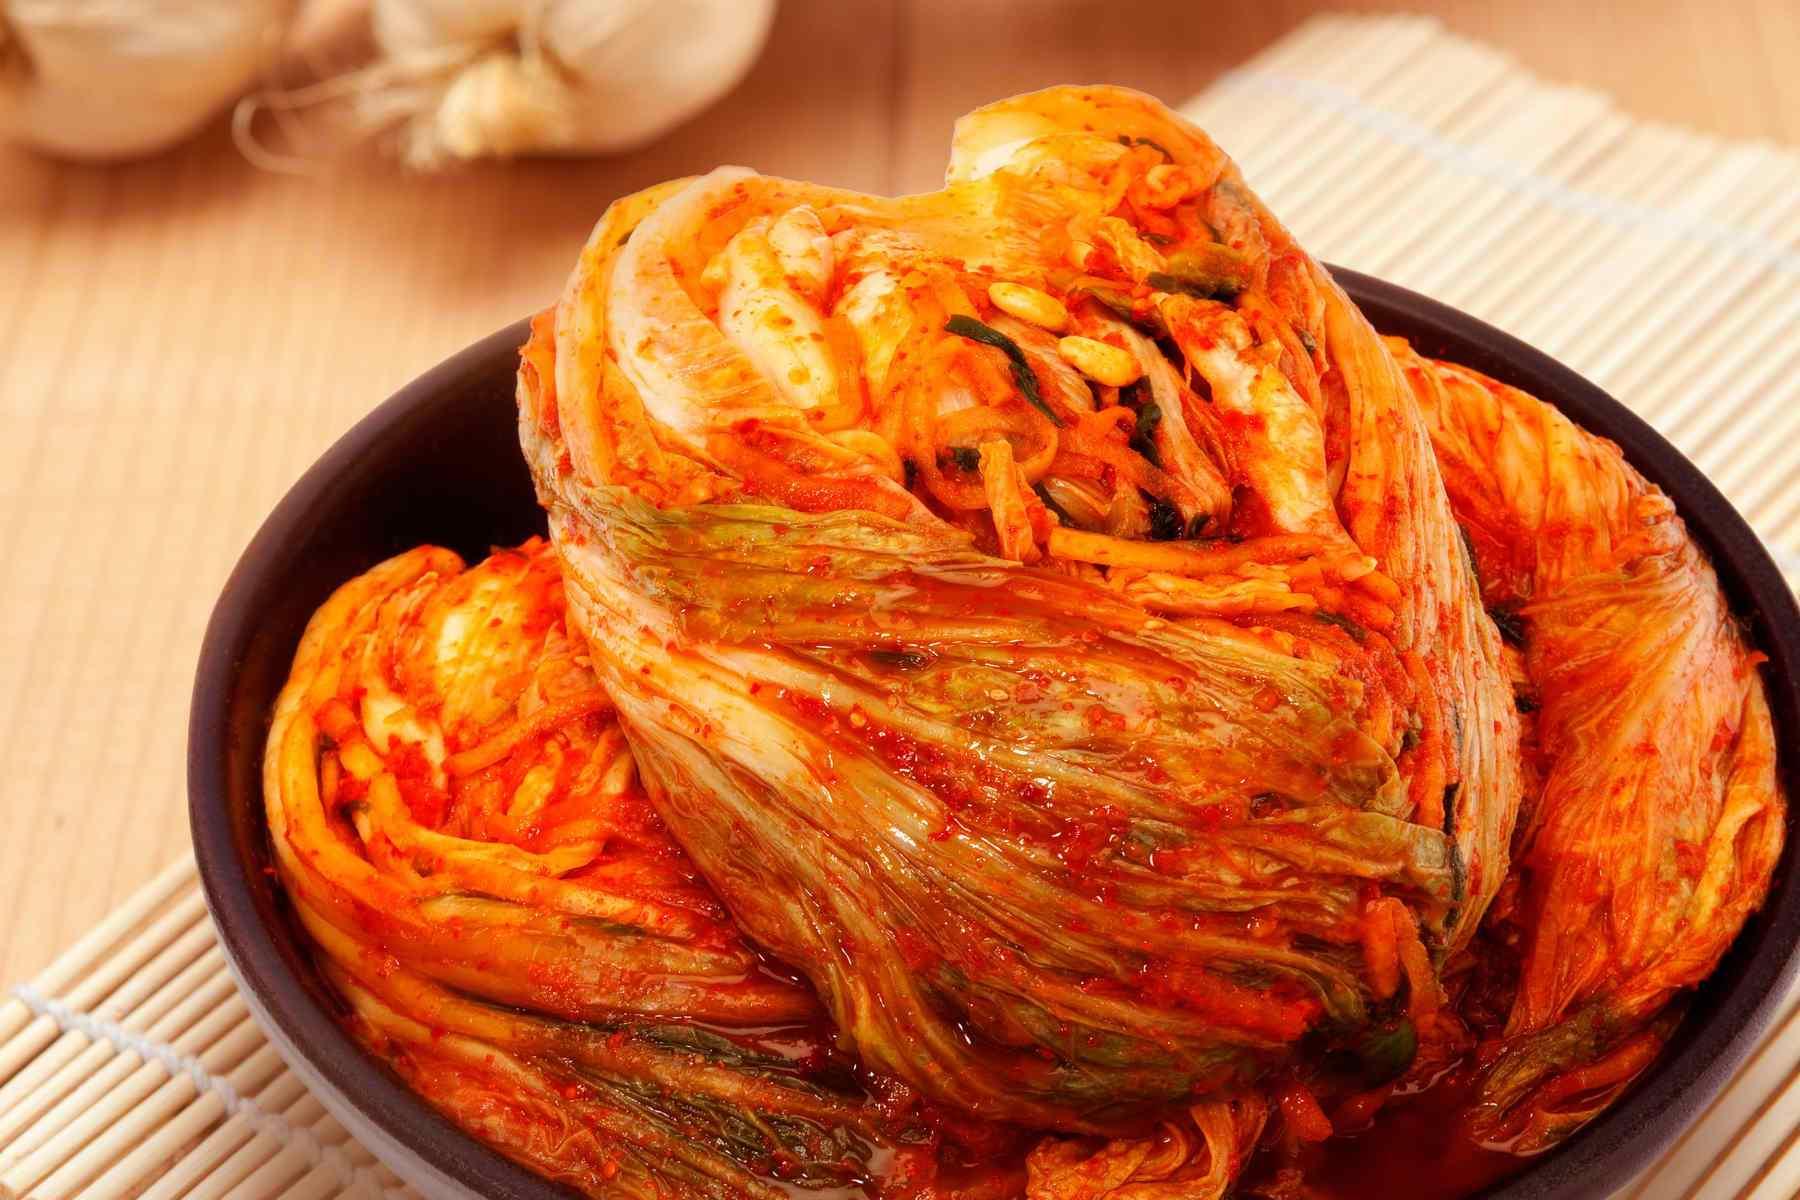 kimchi coree probiotique naturel - The benefits of kichmi for health